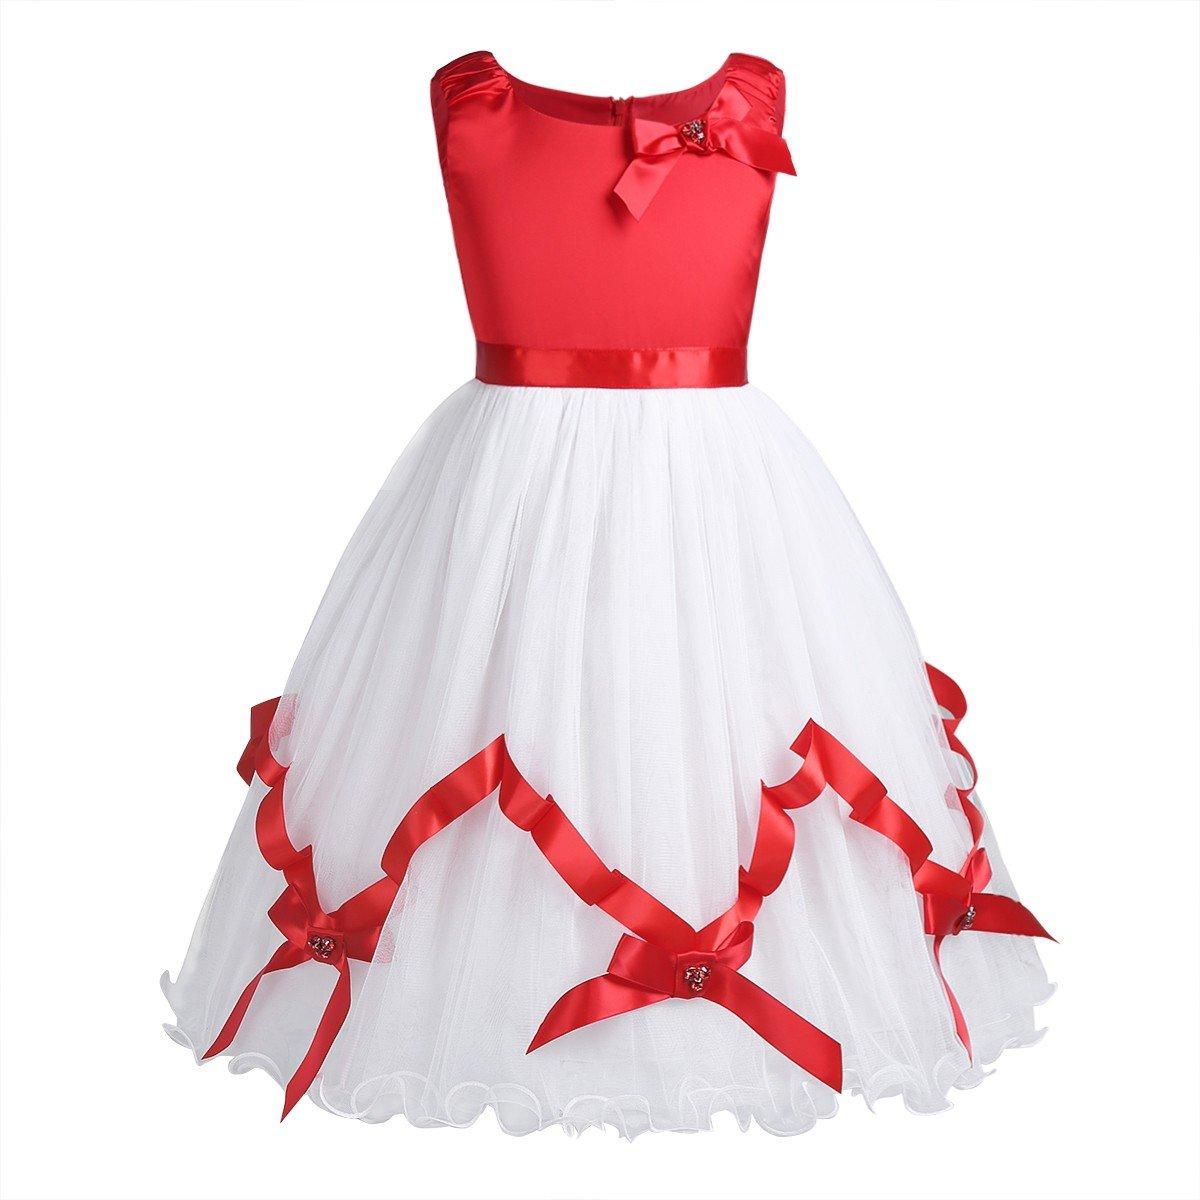 Freebily Girls Satin Mesh Christmas Sleeveless Flower Girl Dress Princess Pageant Wedding Party Dress Red&White 7-8